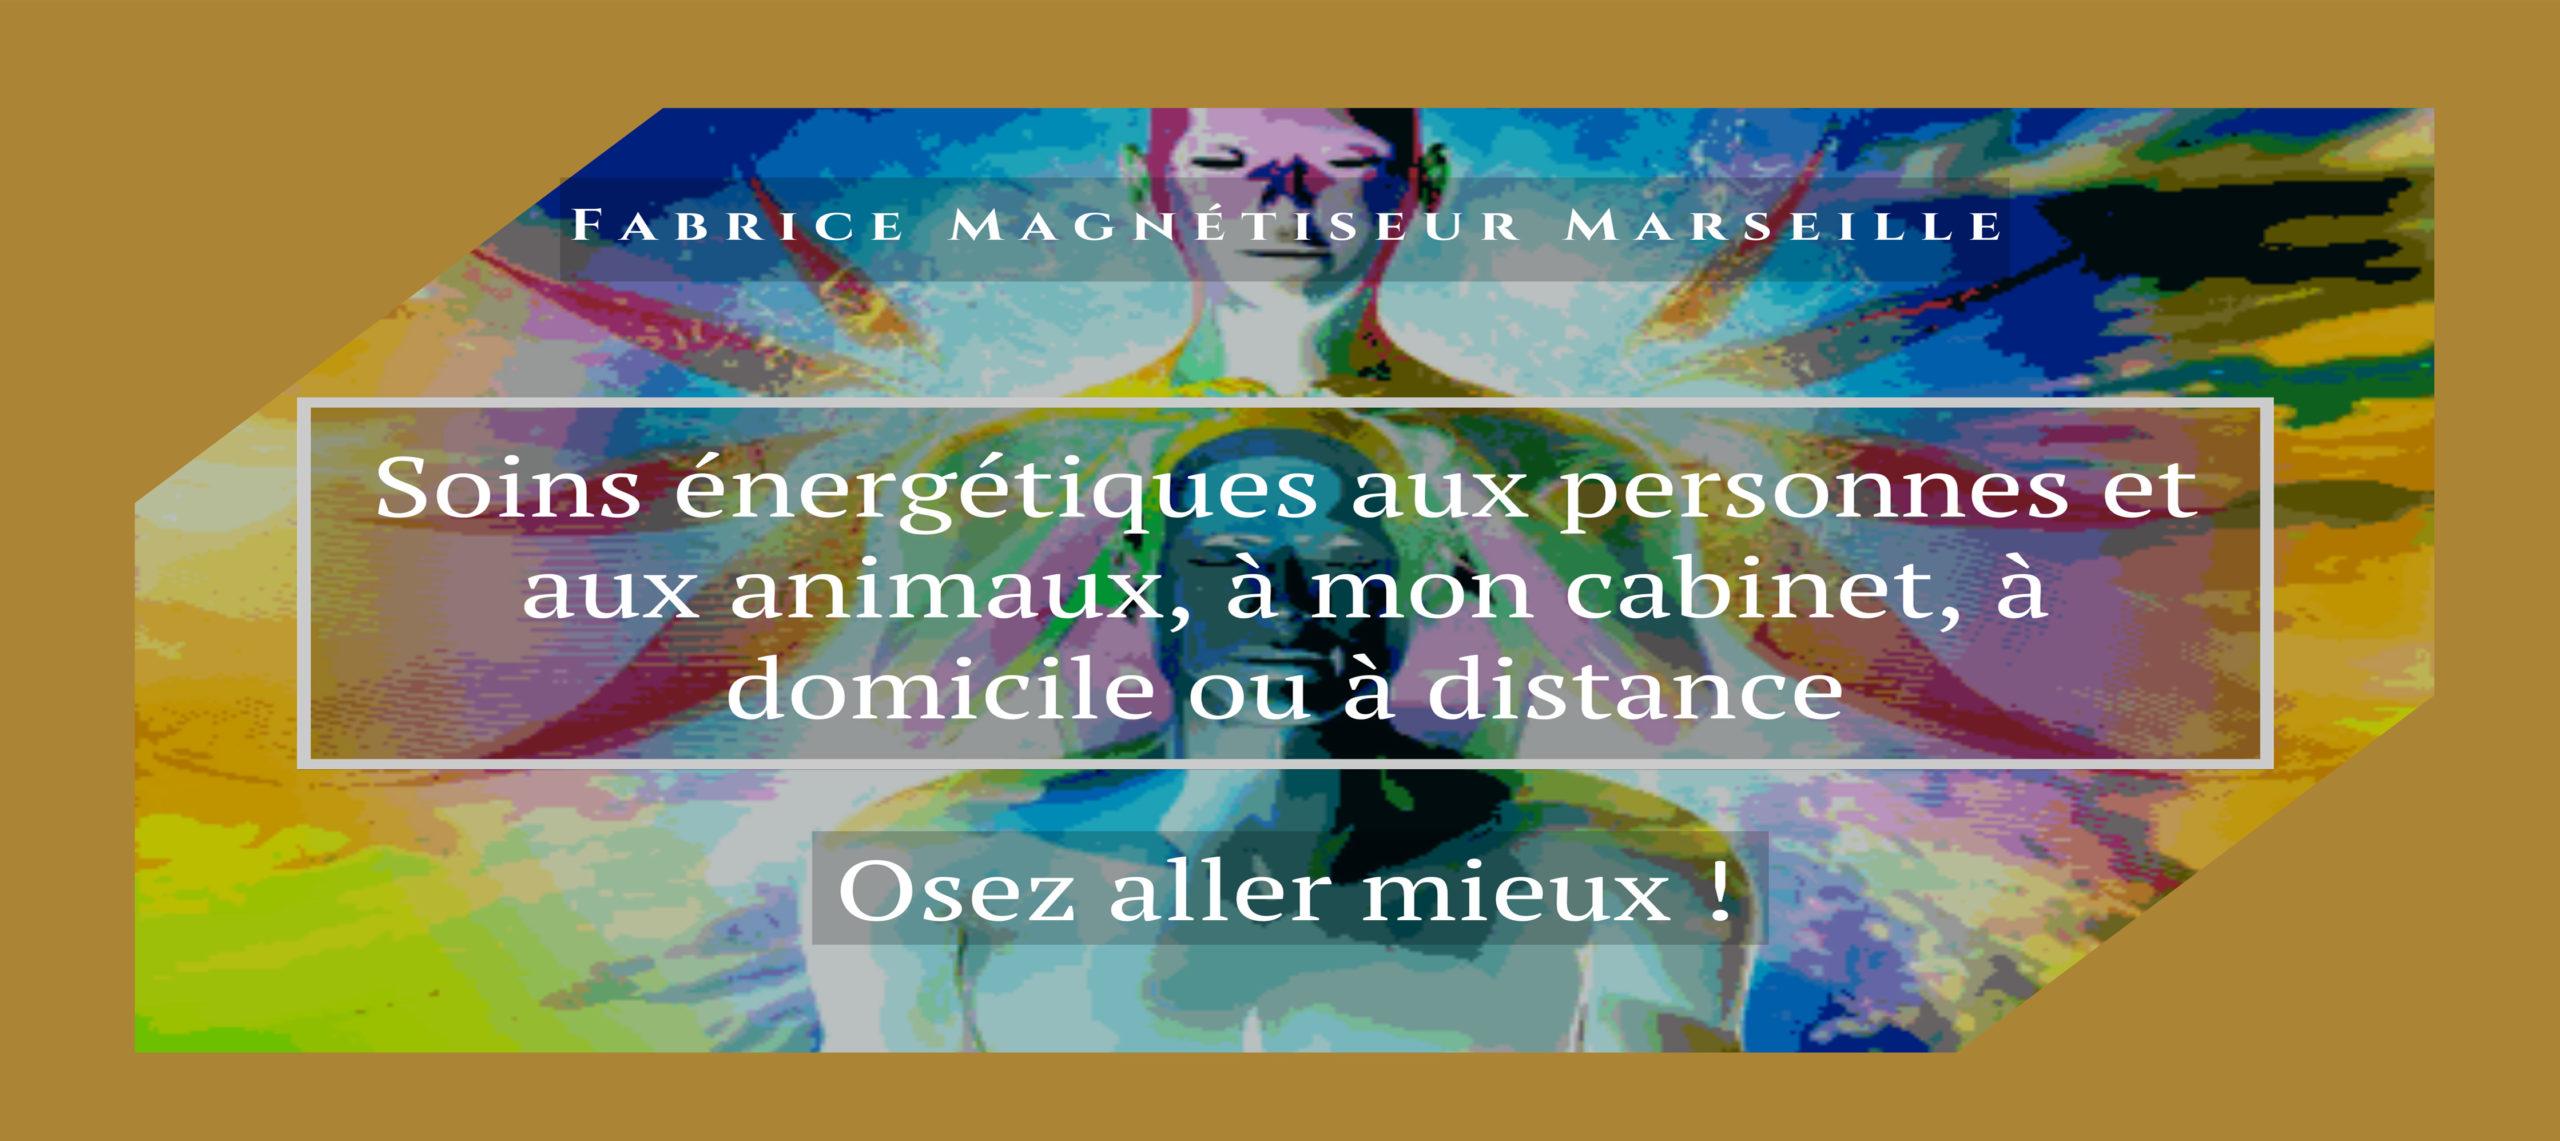 Magnétiseur Marseille Fabrice